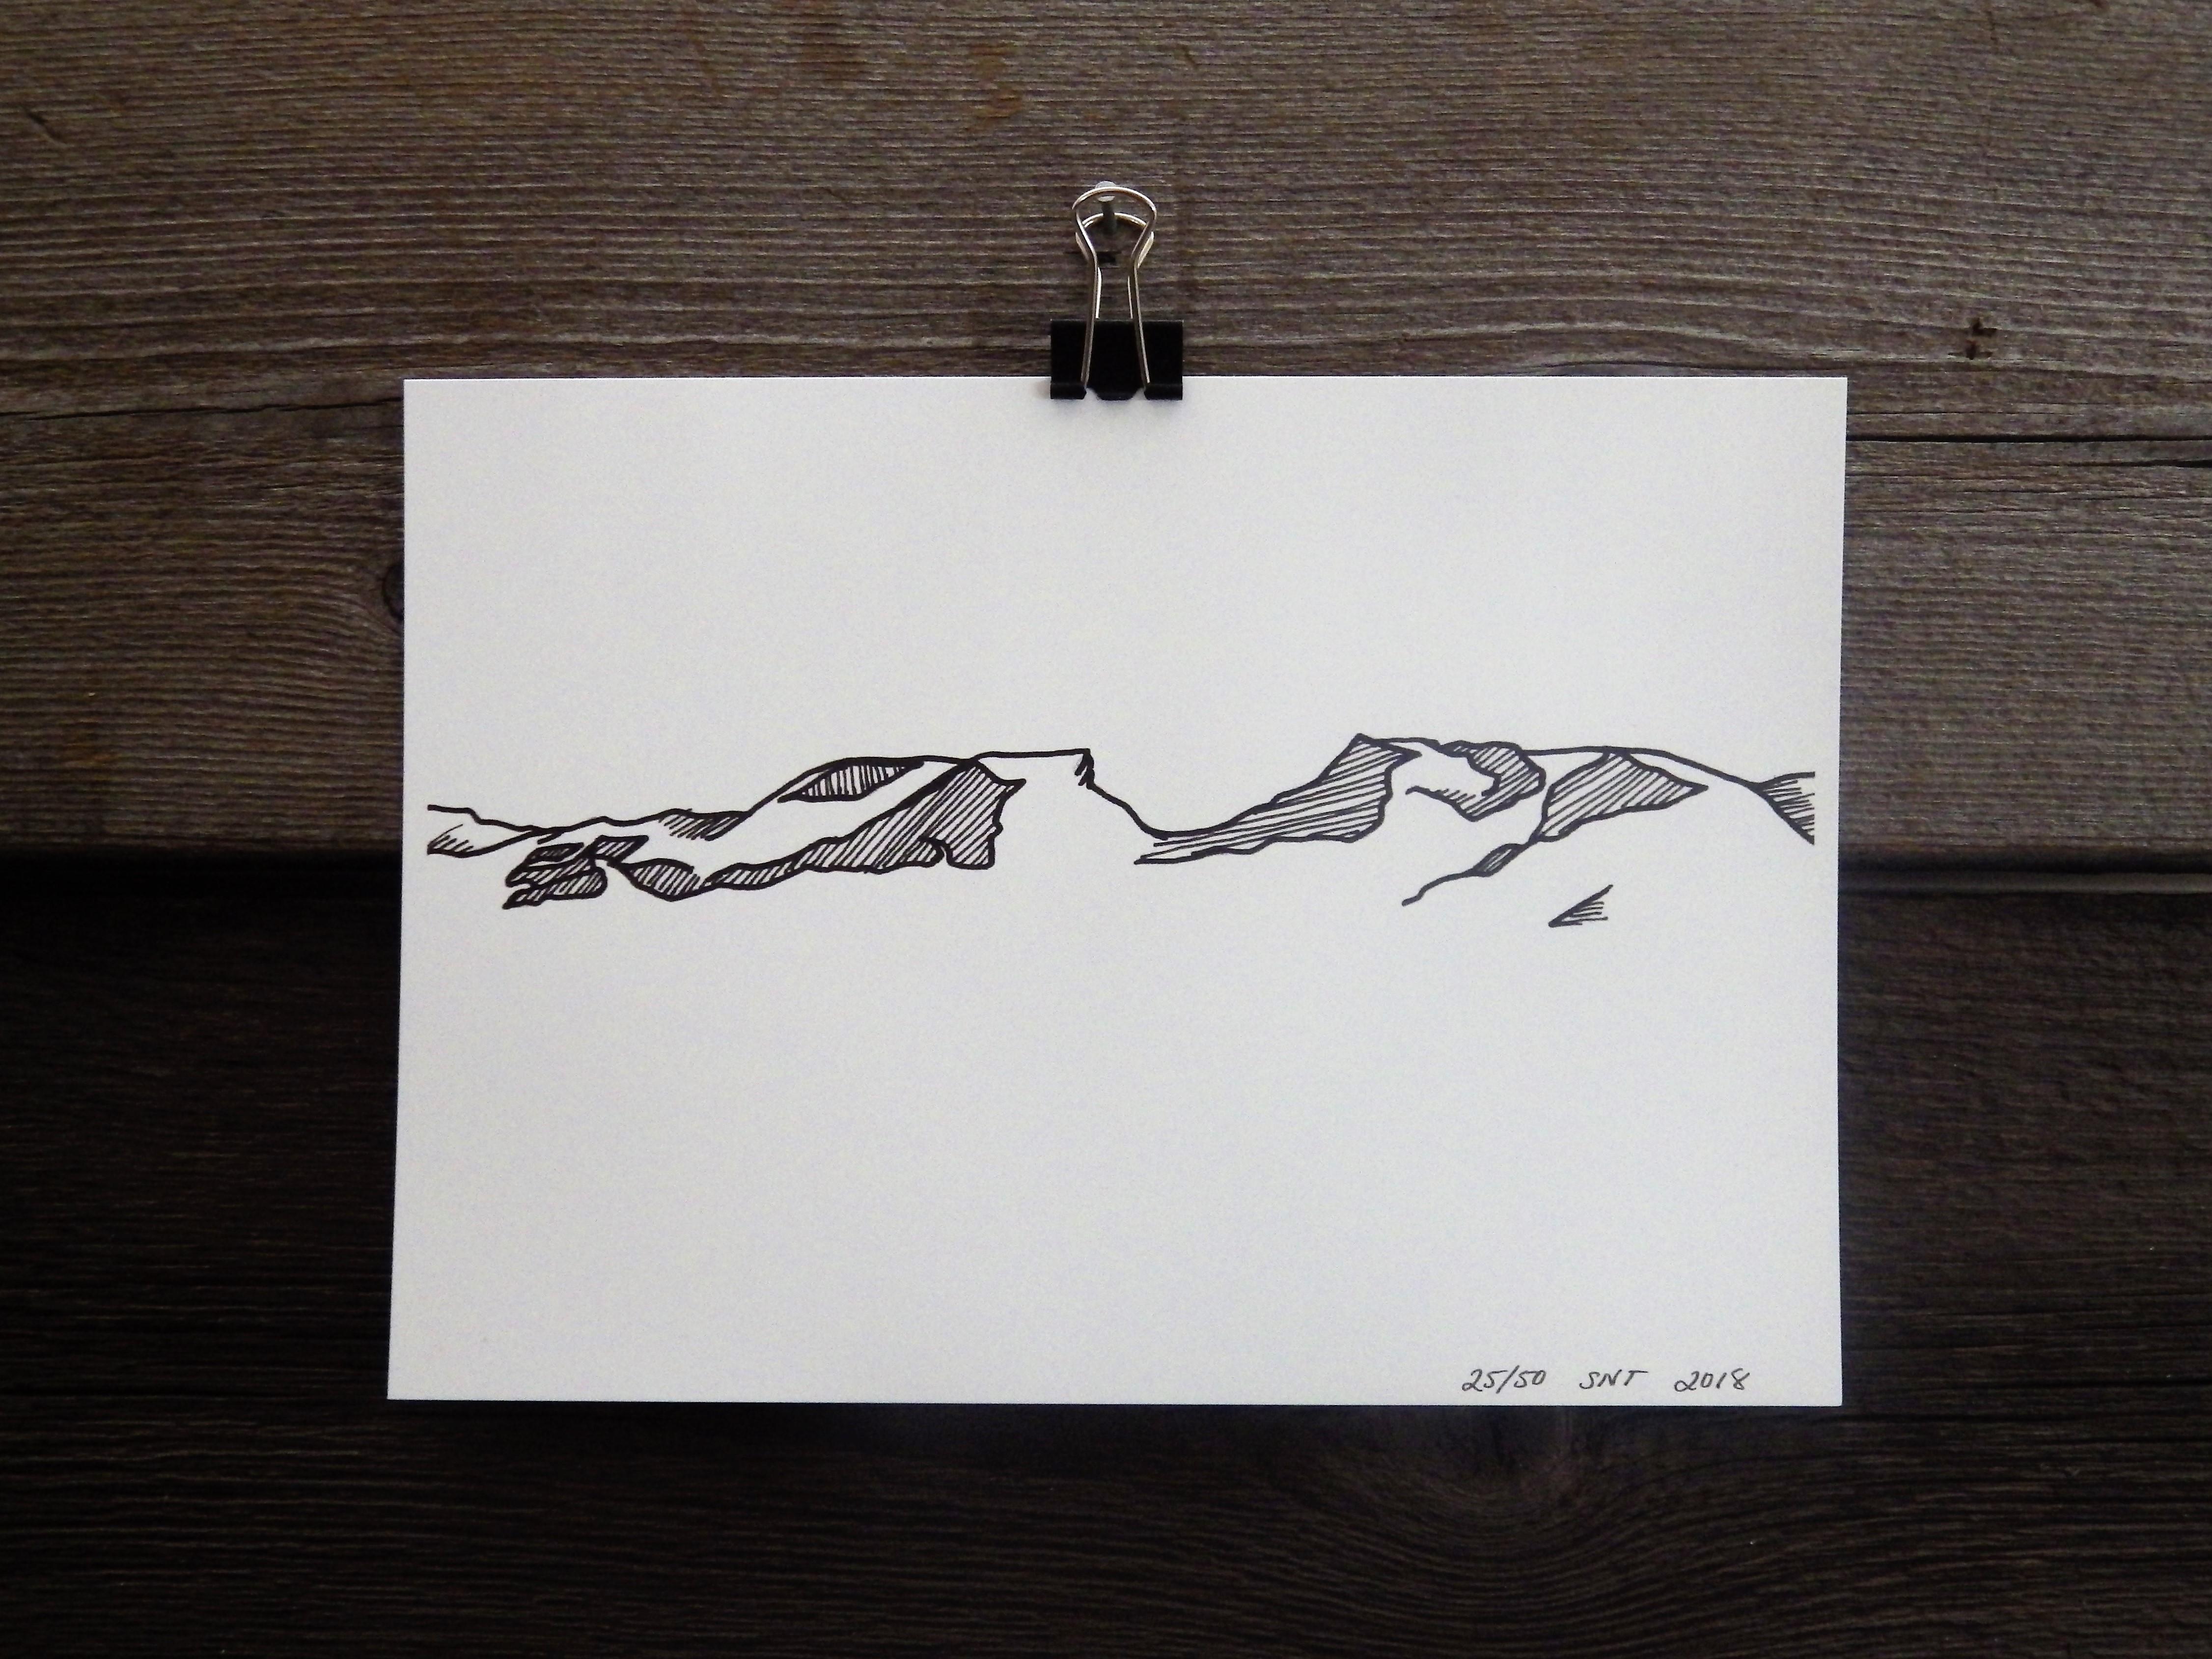 KONSTTRYCK - Lapporten